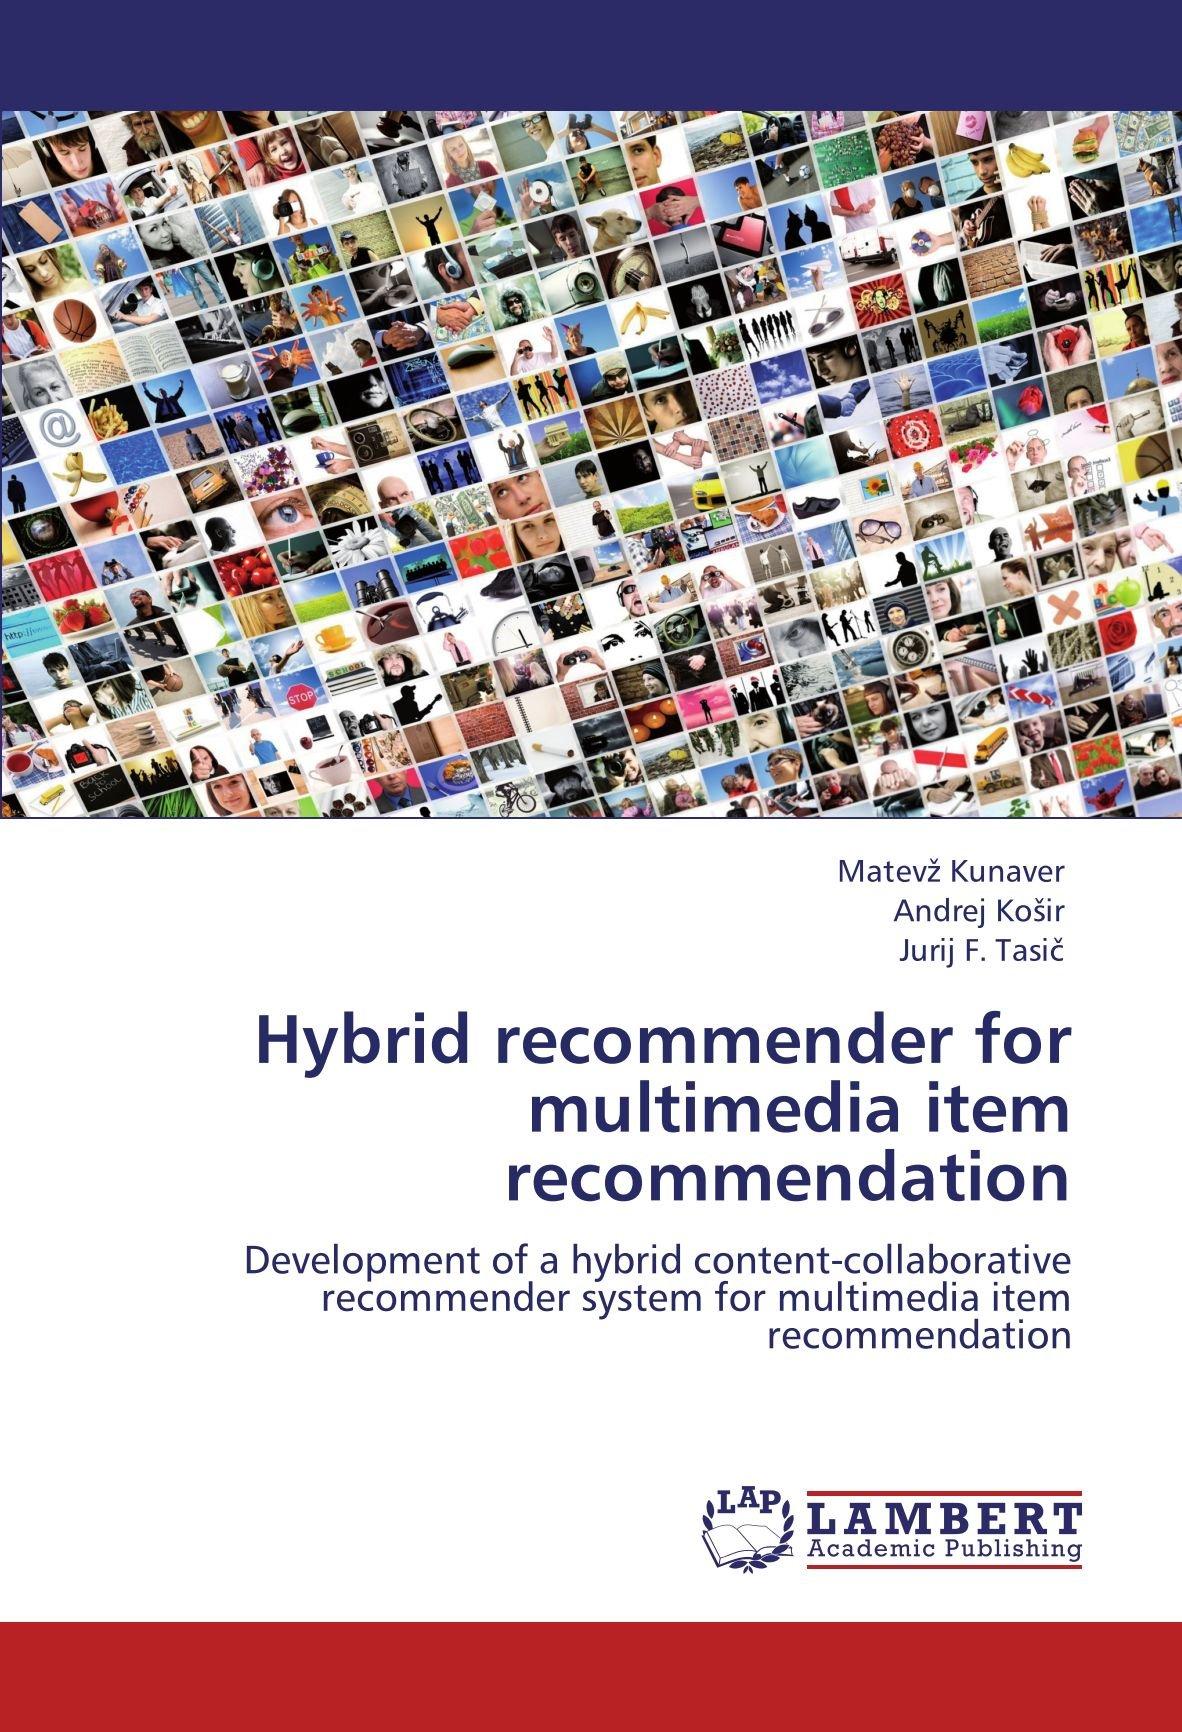 Hybrid recommender for multimedia item recommendation